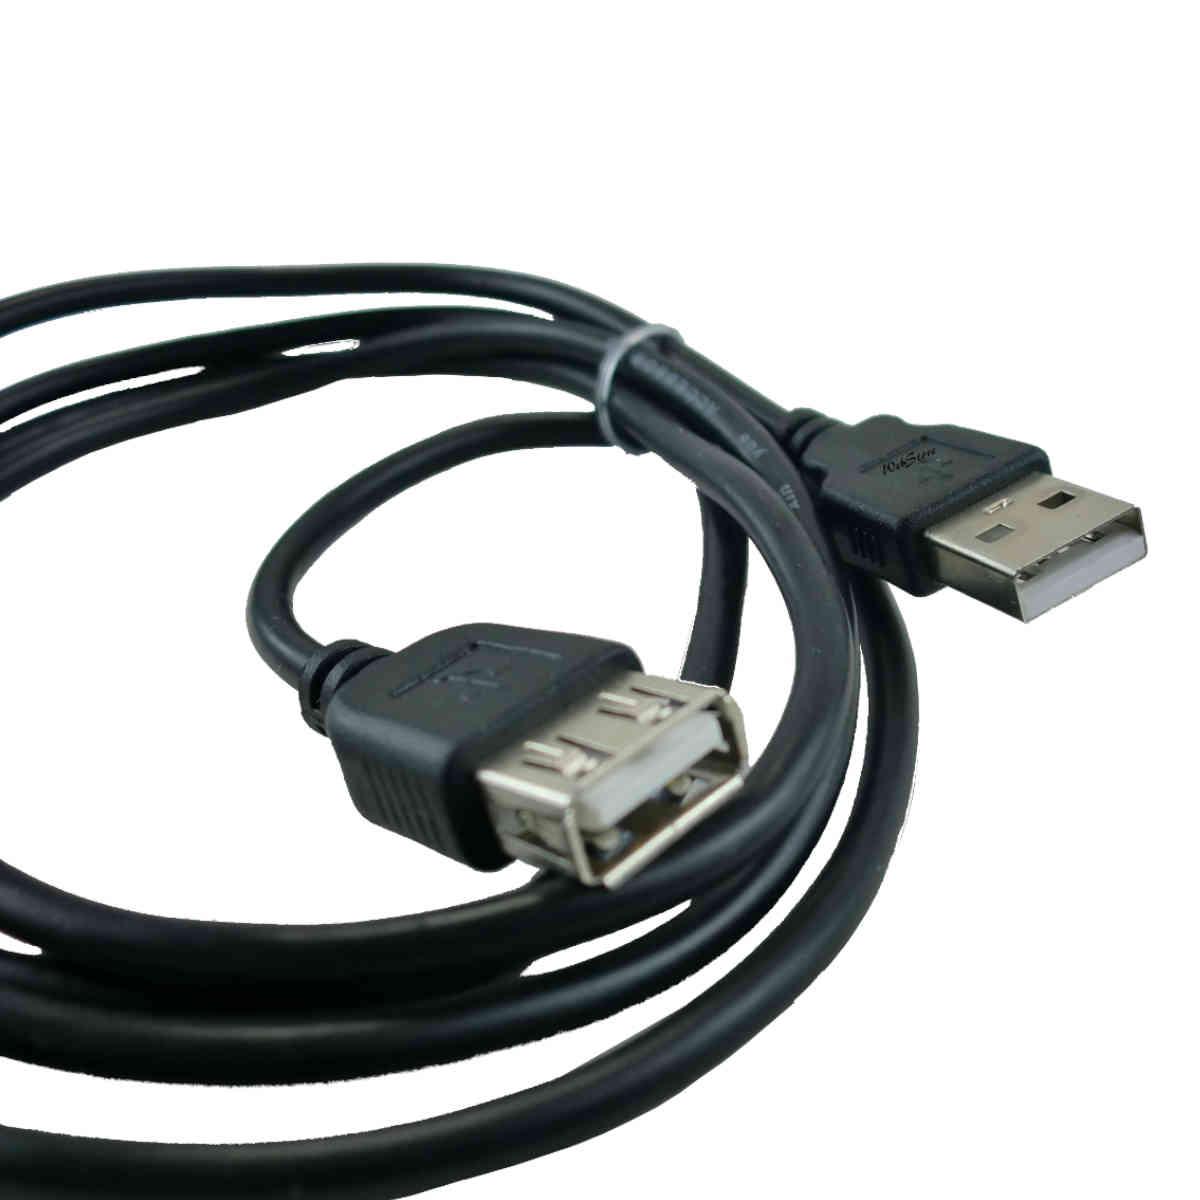 Cabo Extensor USB 3 metros A macho para A femea Plus Cable